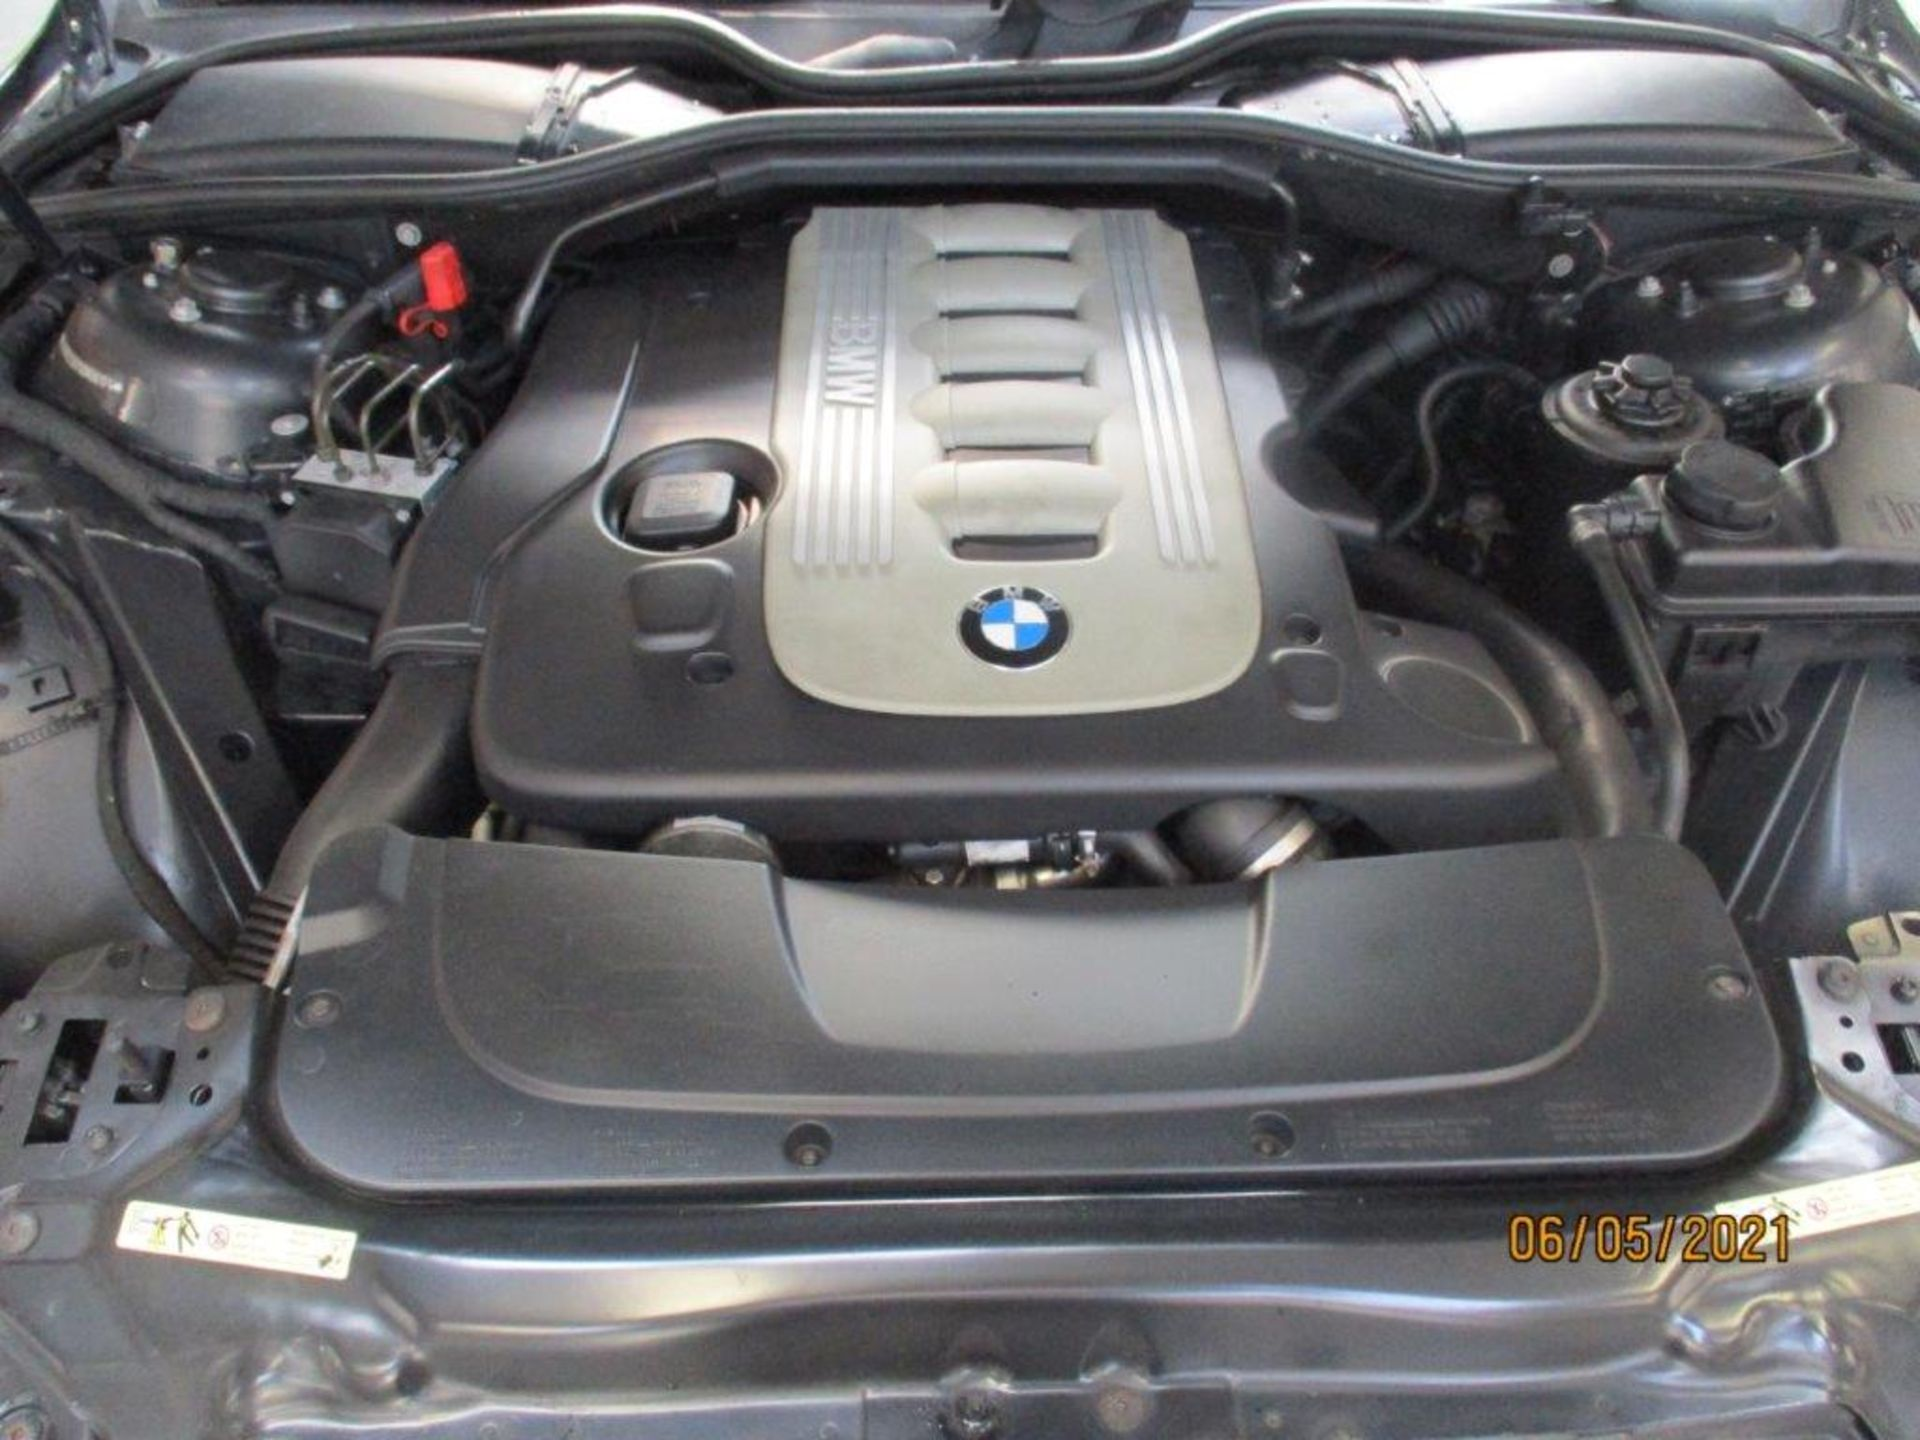 06 06 BMW 730 D Sport Auto - Image 11 of 23